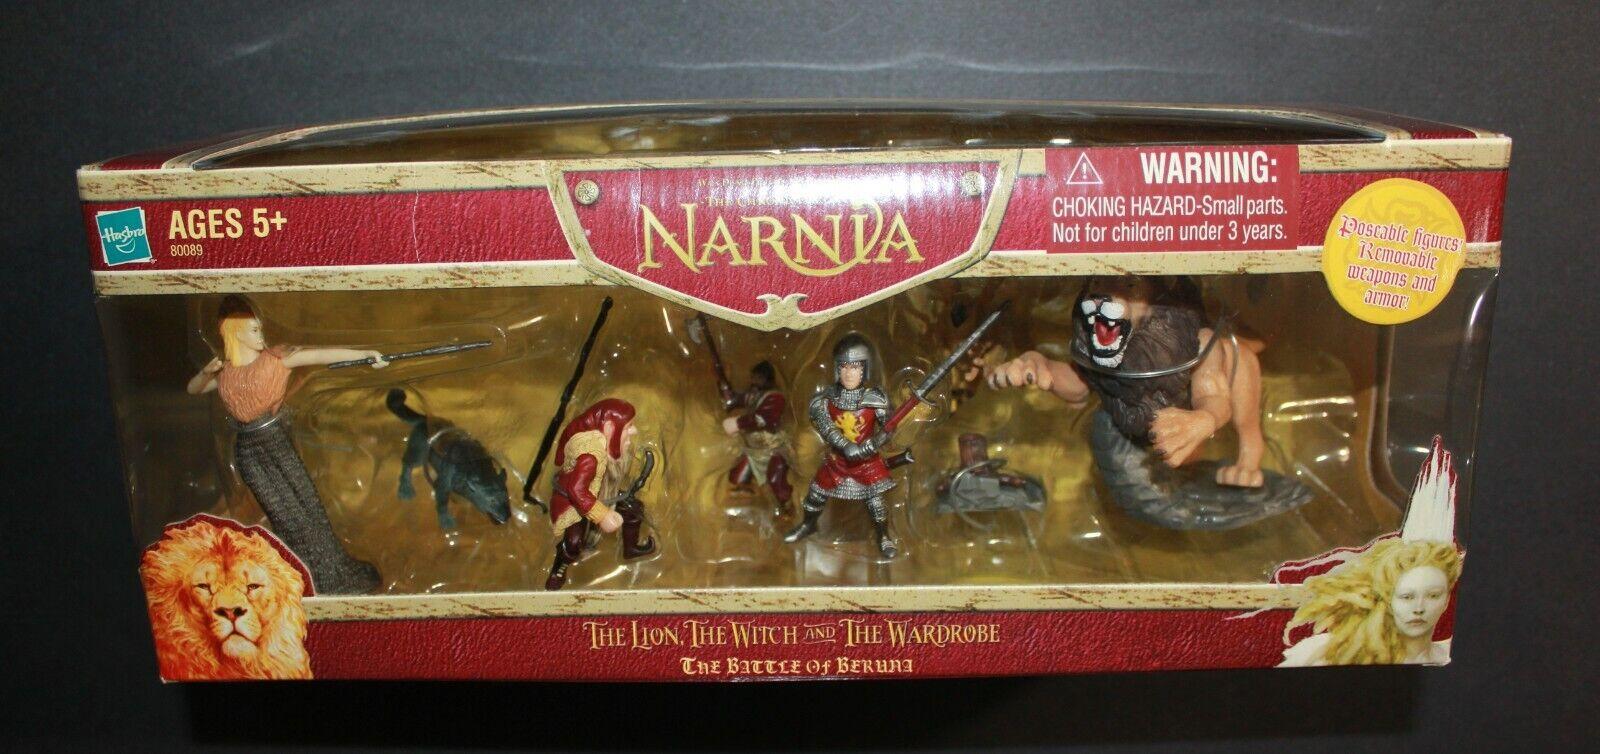 HASBRO NARNIA THE BATTLE OF BERUNA ACTION FIGURE PLAY SET NE